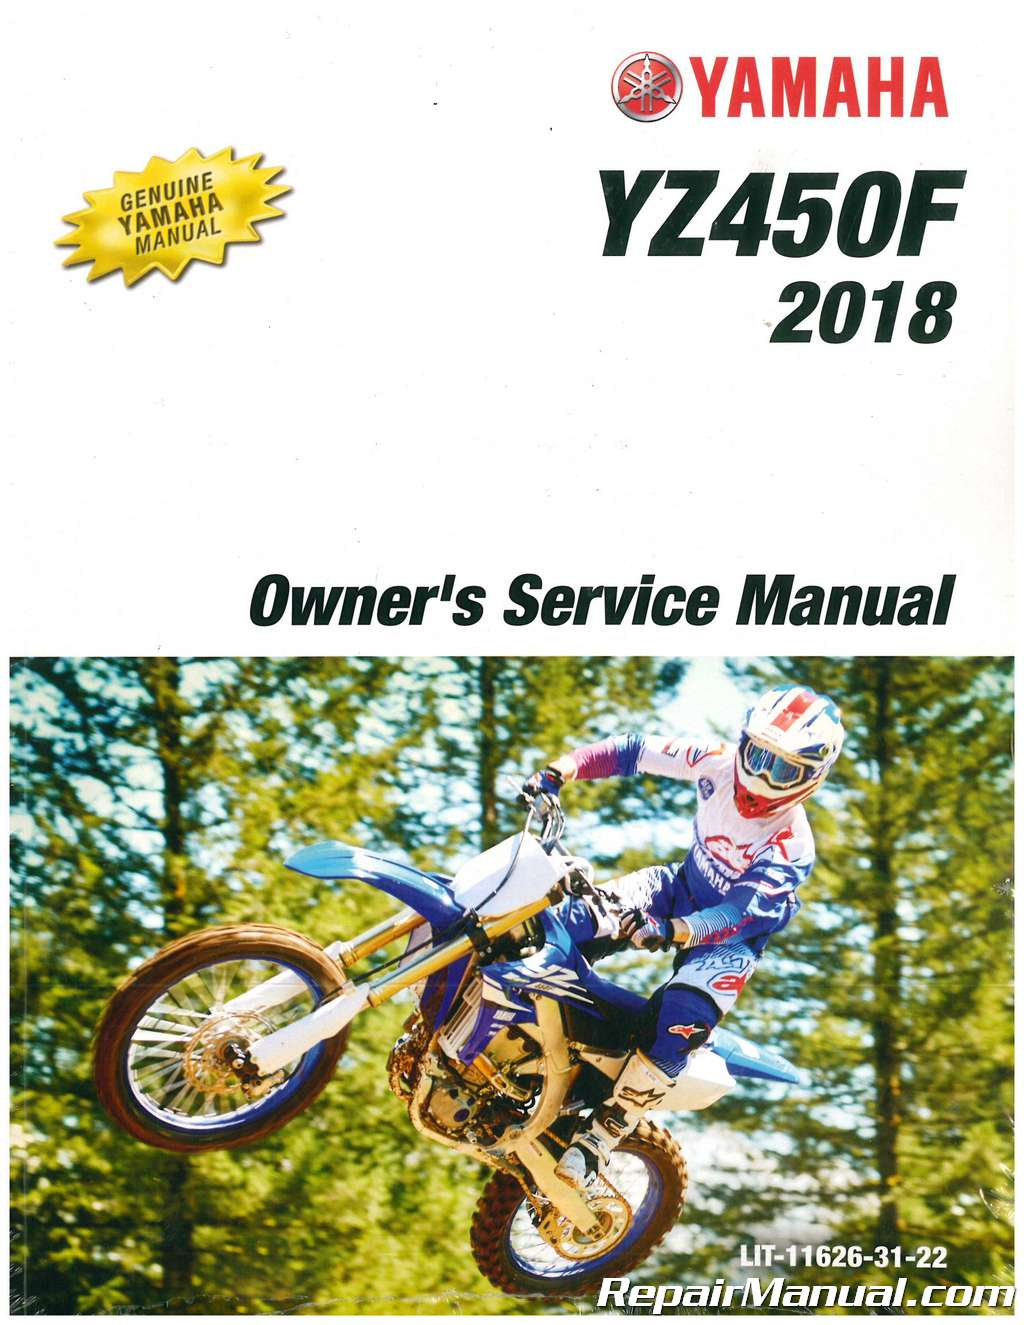 2007 yamaha yz450f owners manual.